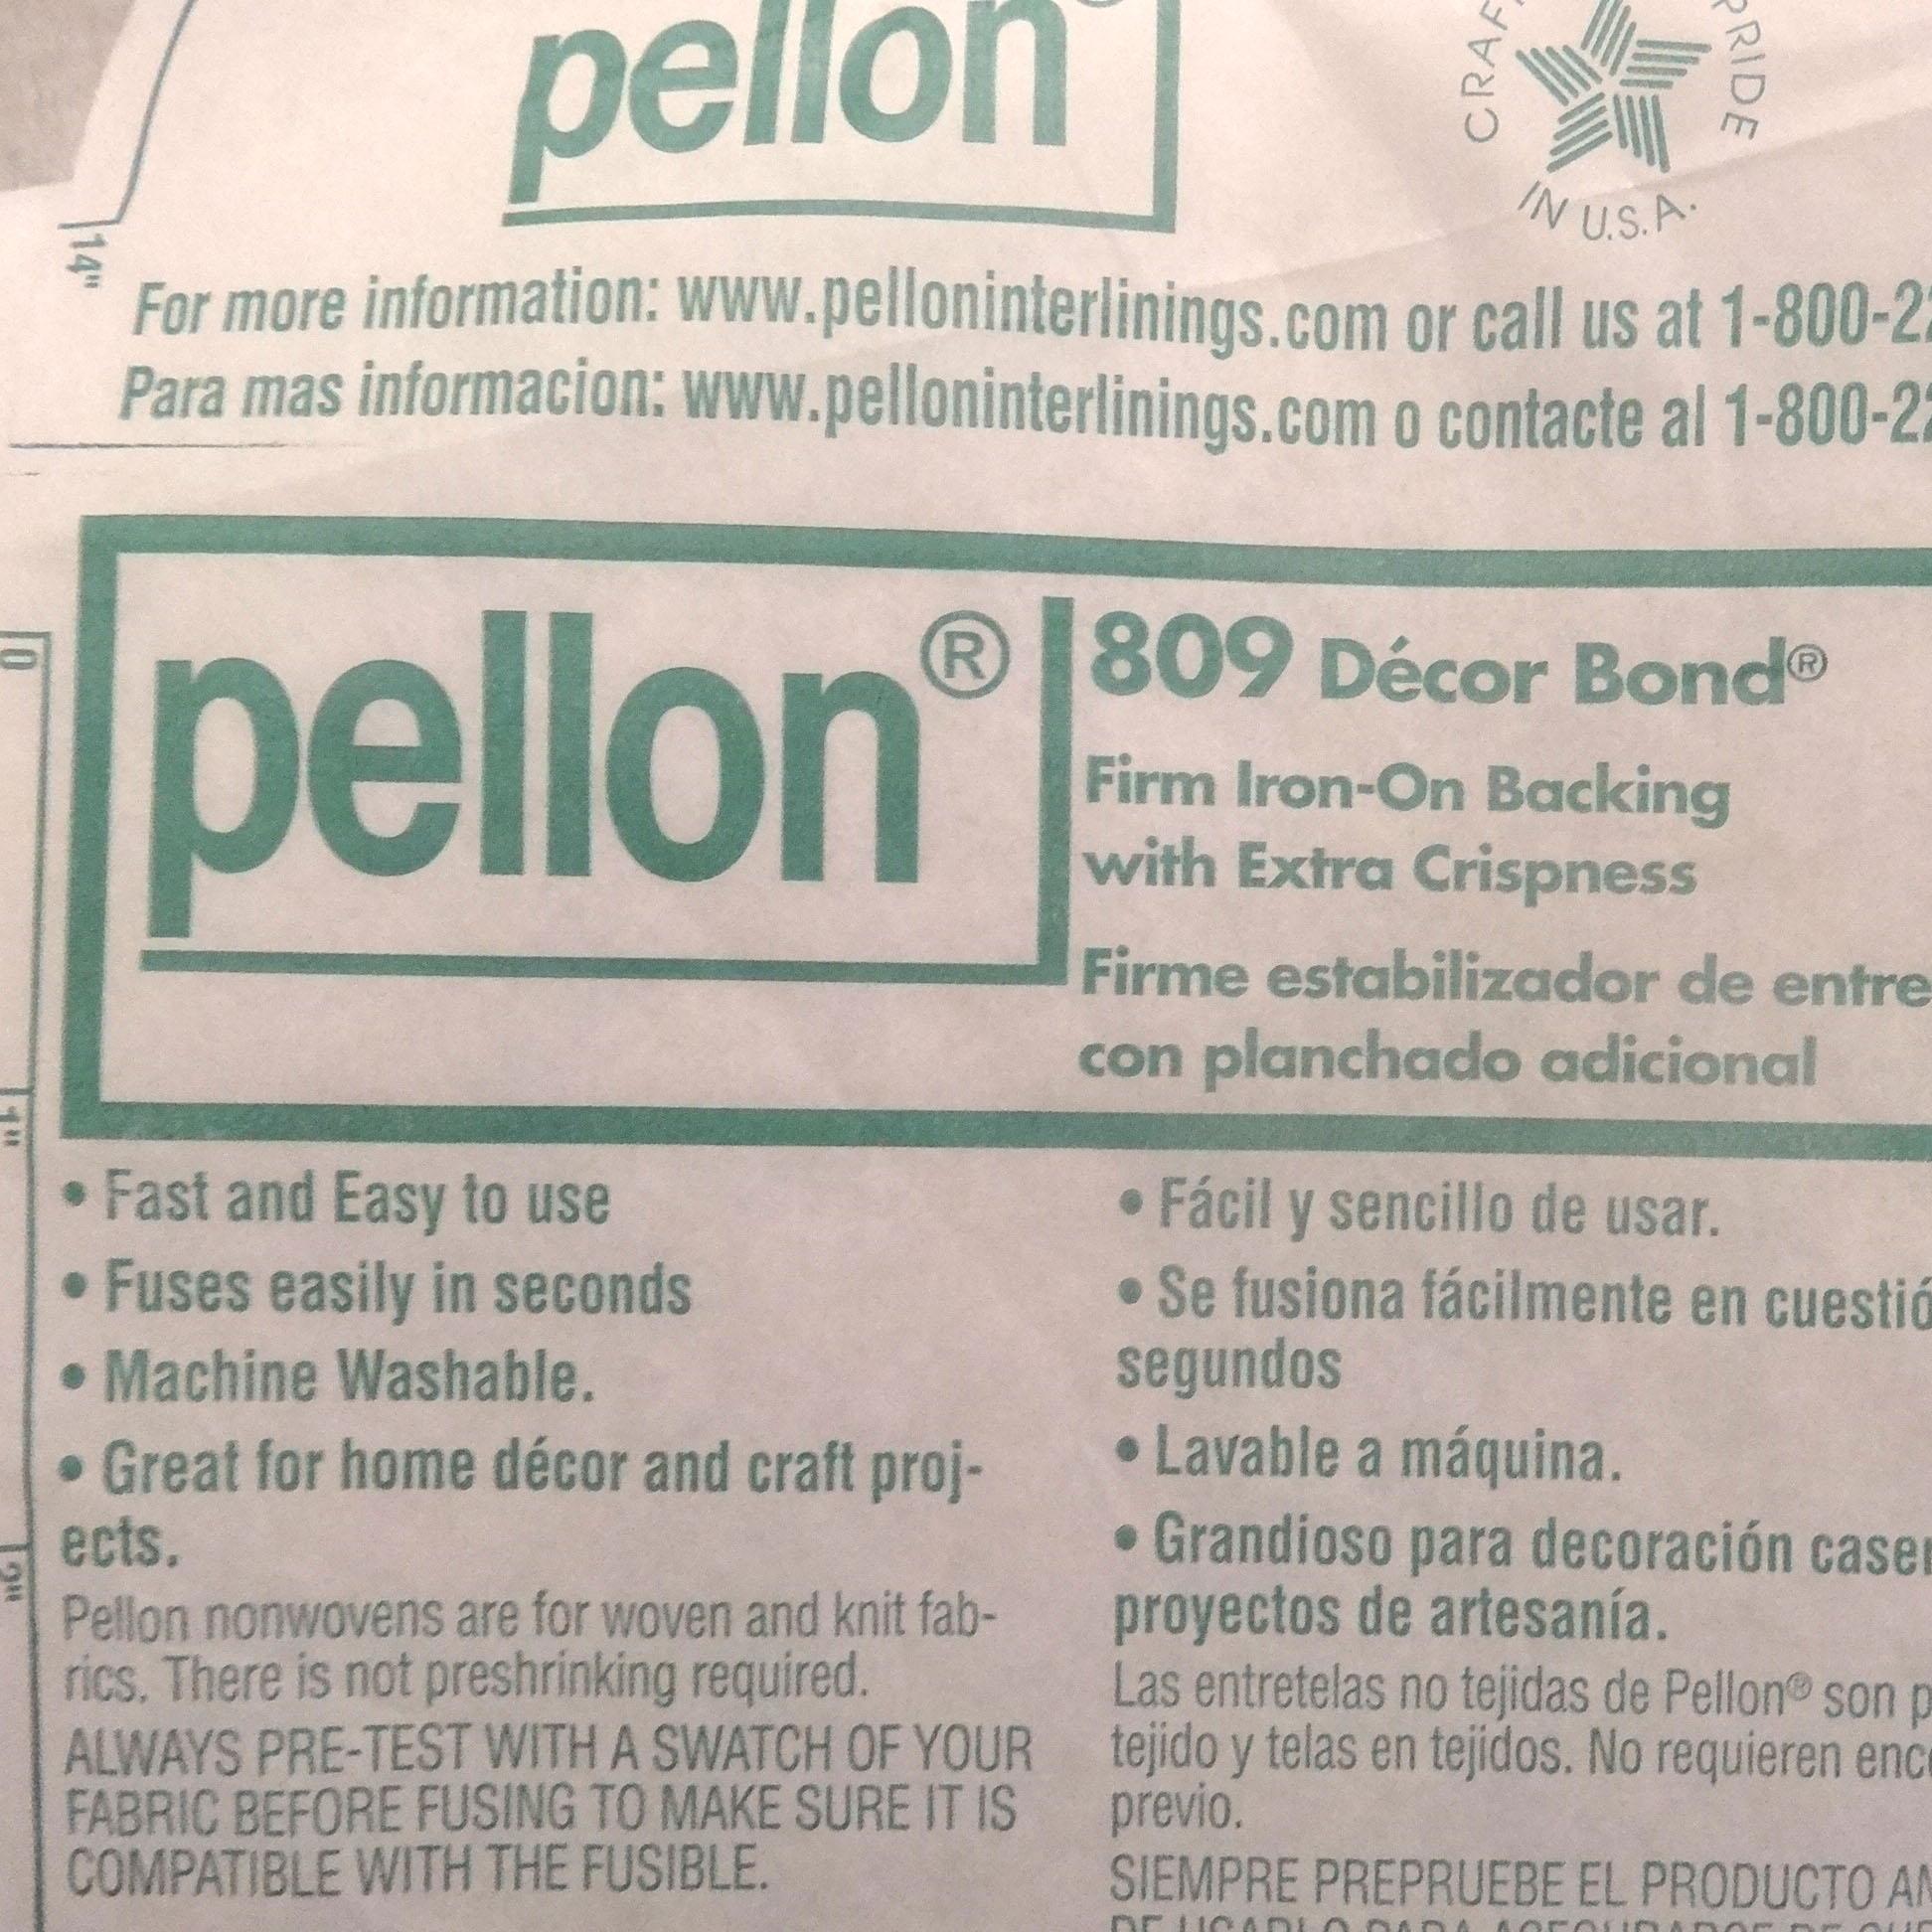 Pellon 809 Decor Bond Techieblogie Info